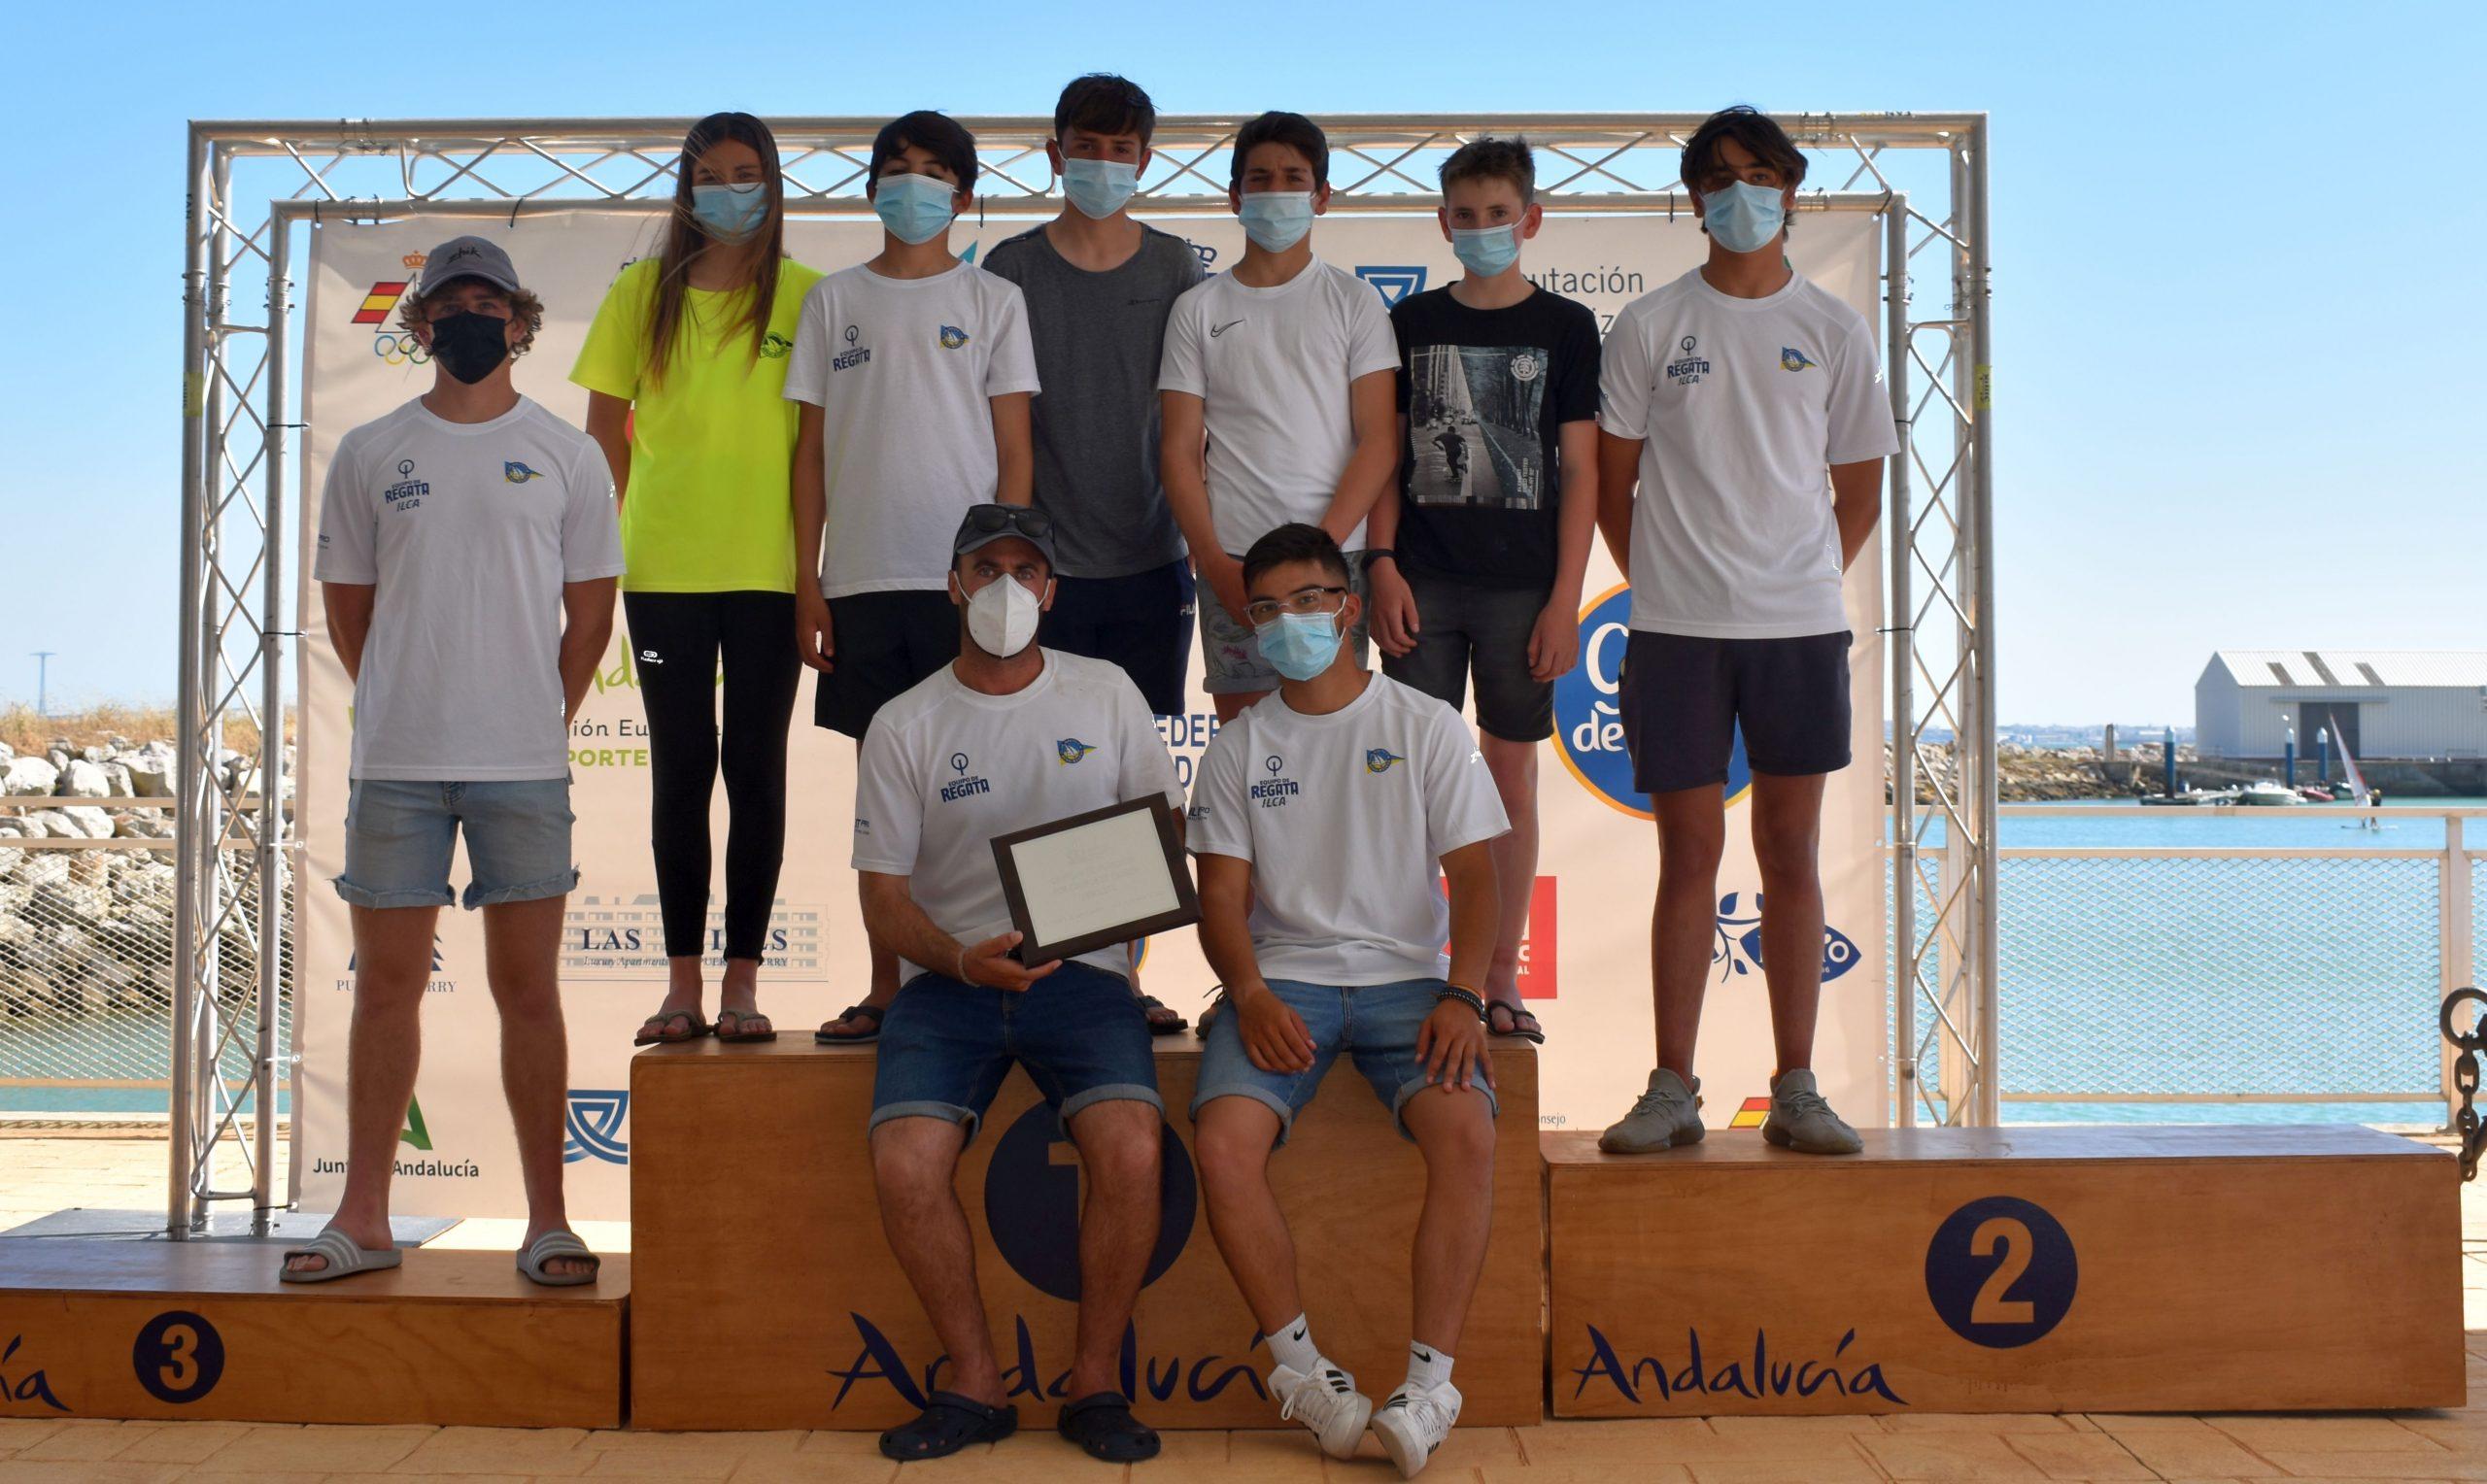 Campeonato De Andalucía De Equipos De Clubes